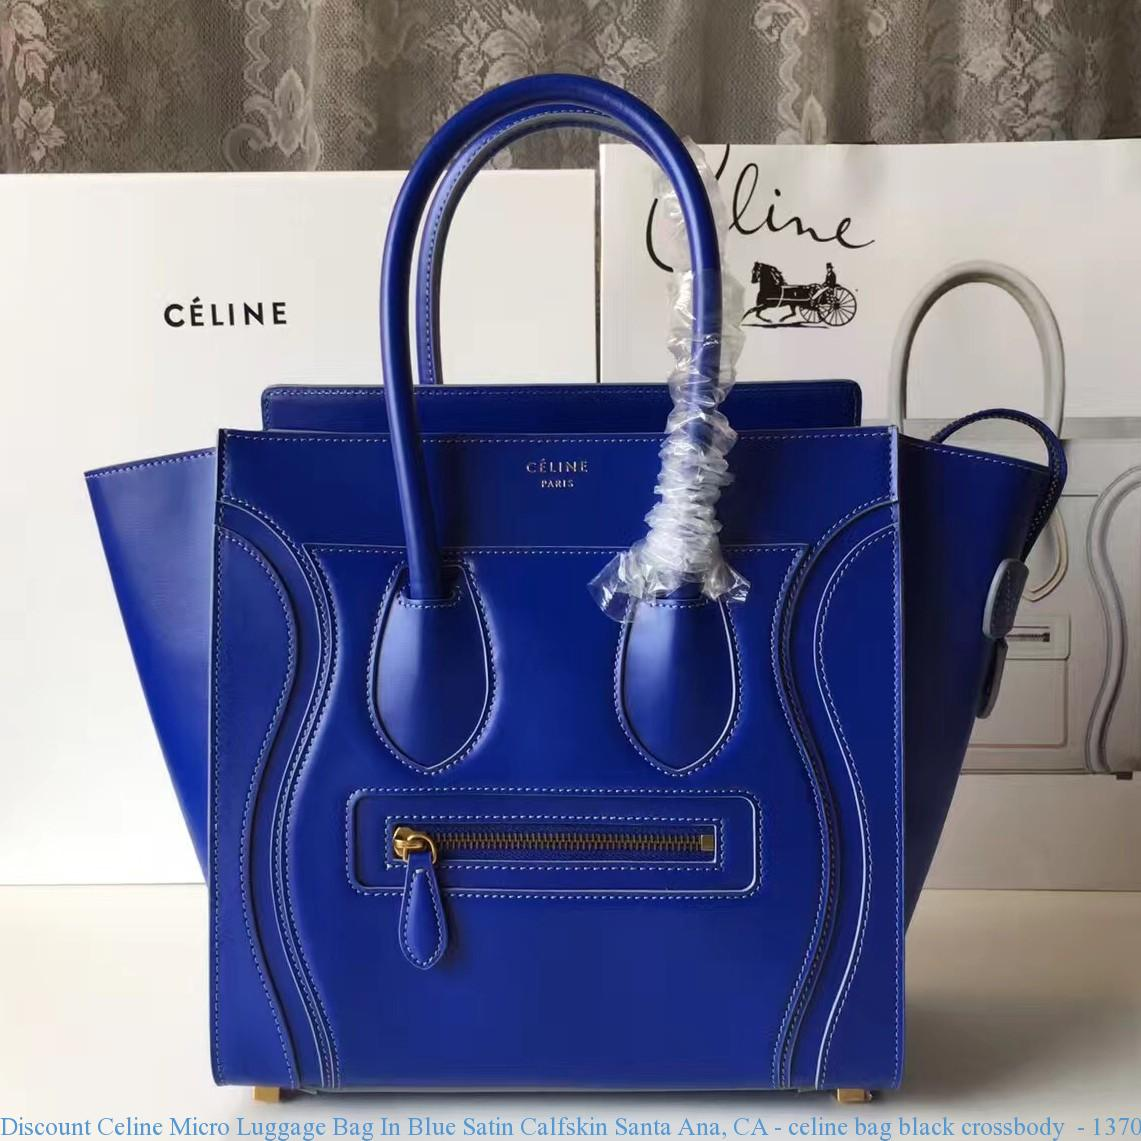 e88b6990c502 Discount Celine Micro Luggage Bag In Blue Satin Calfskin Santa Ana ...